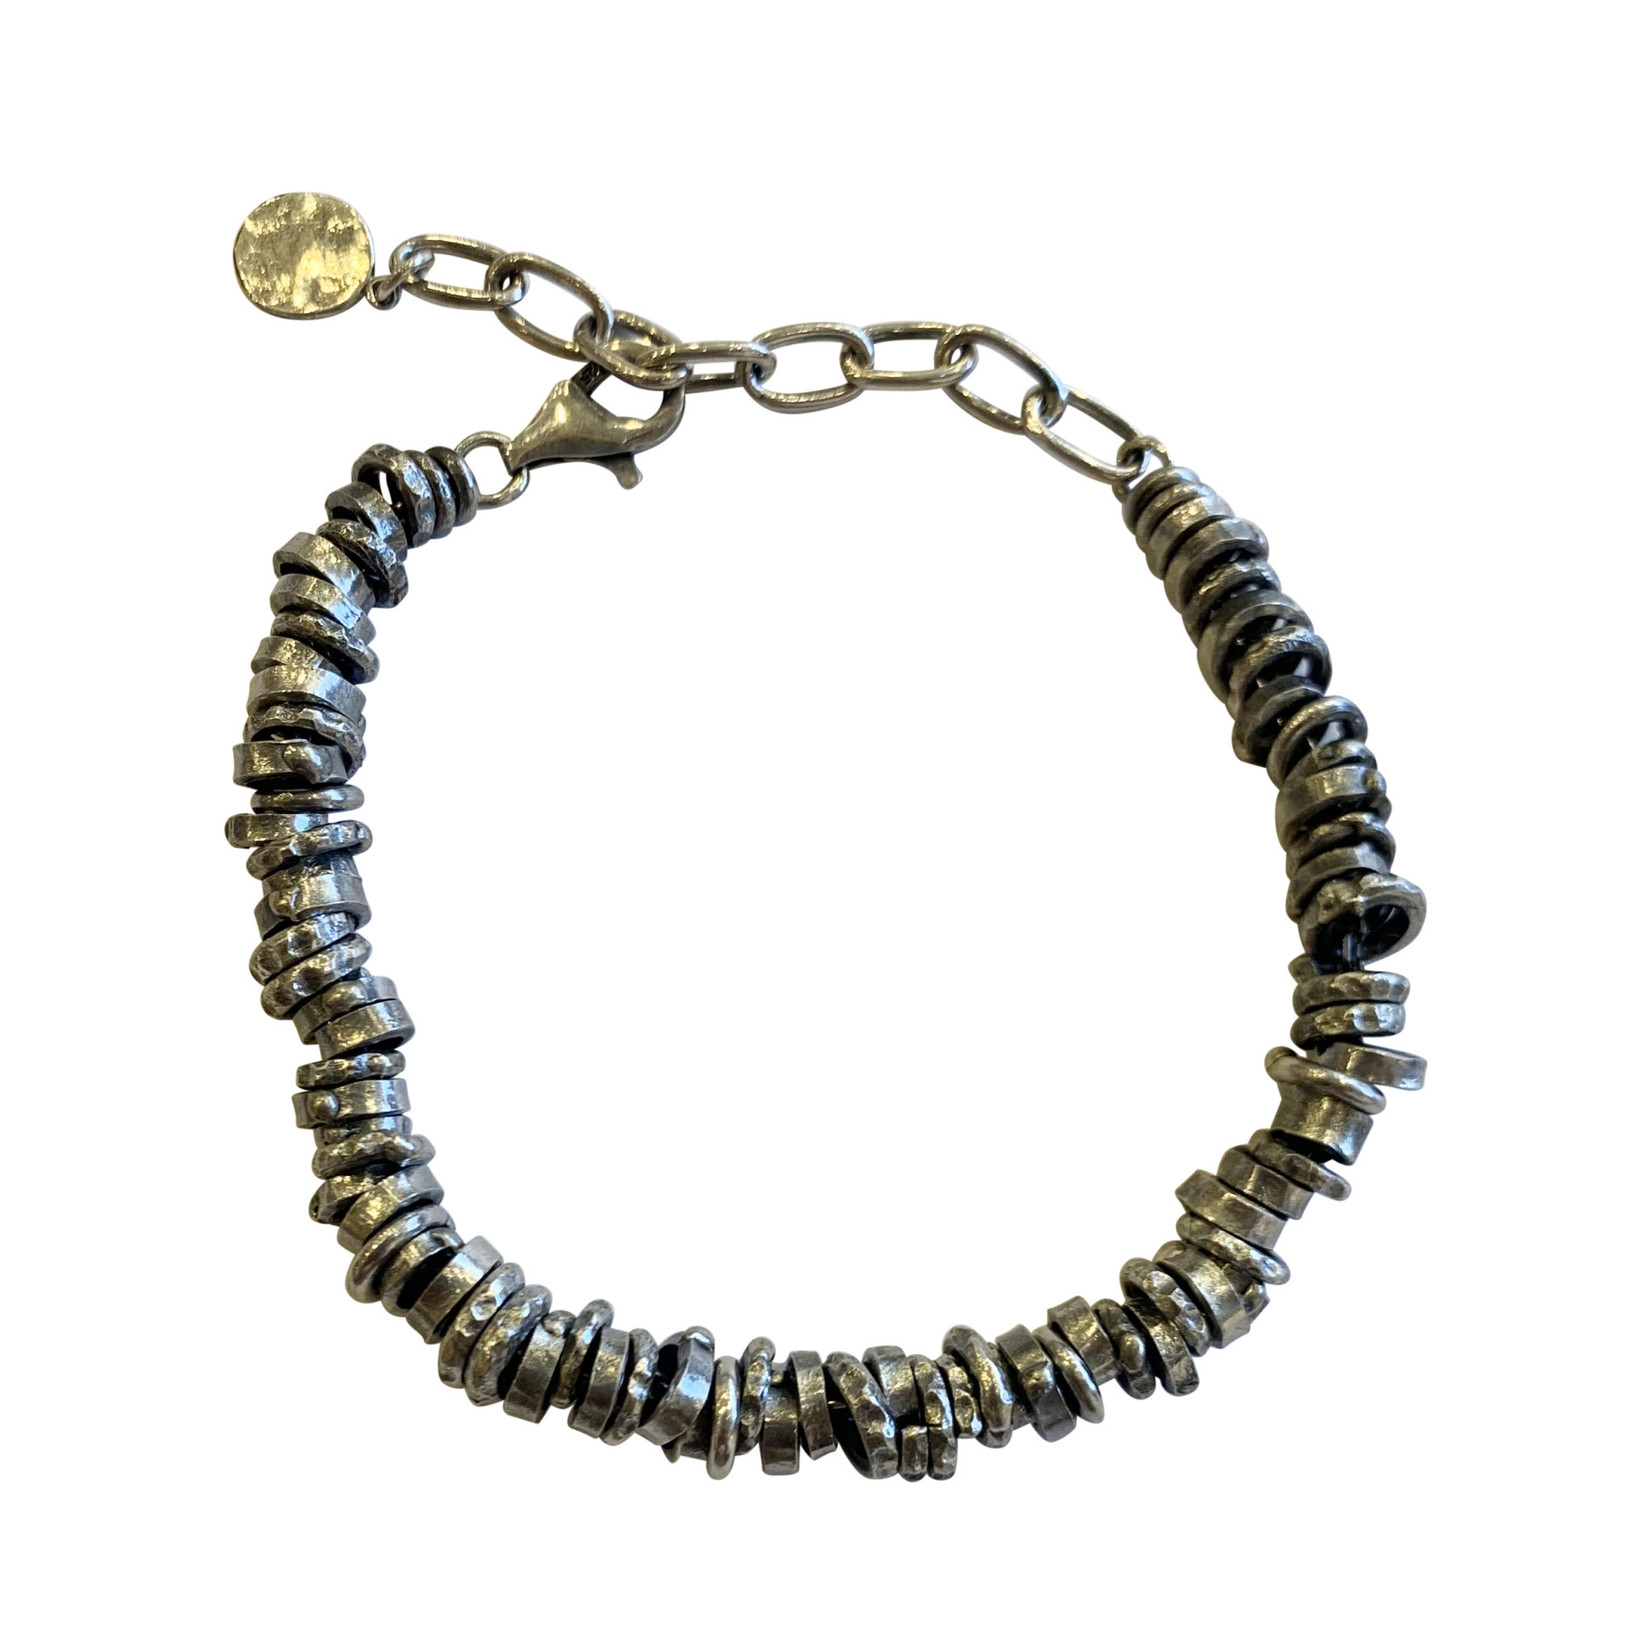 Buck Palmer Rustic Charm Bracelet